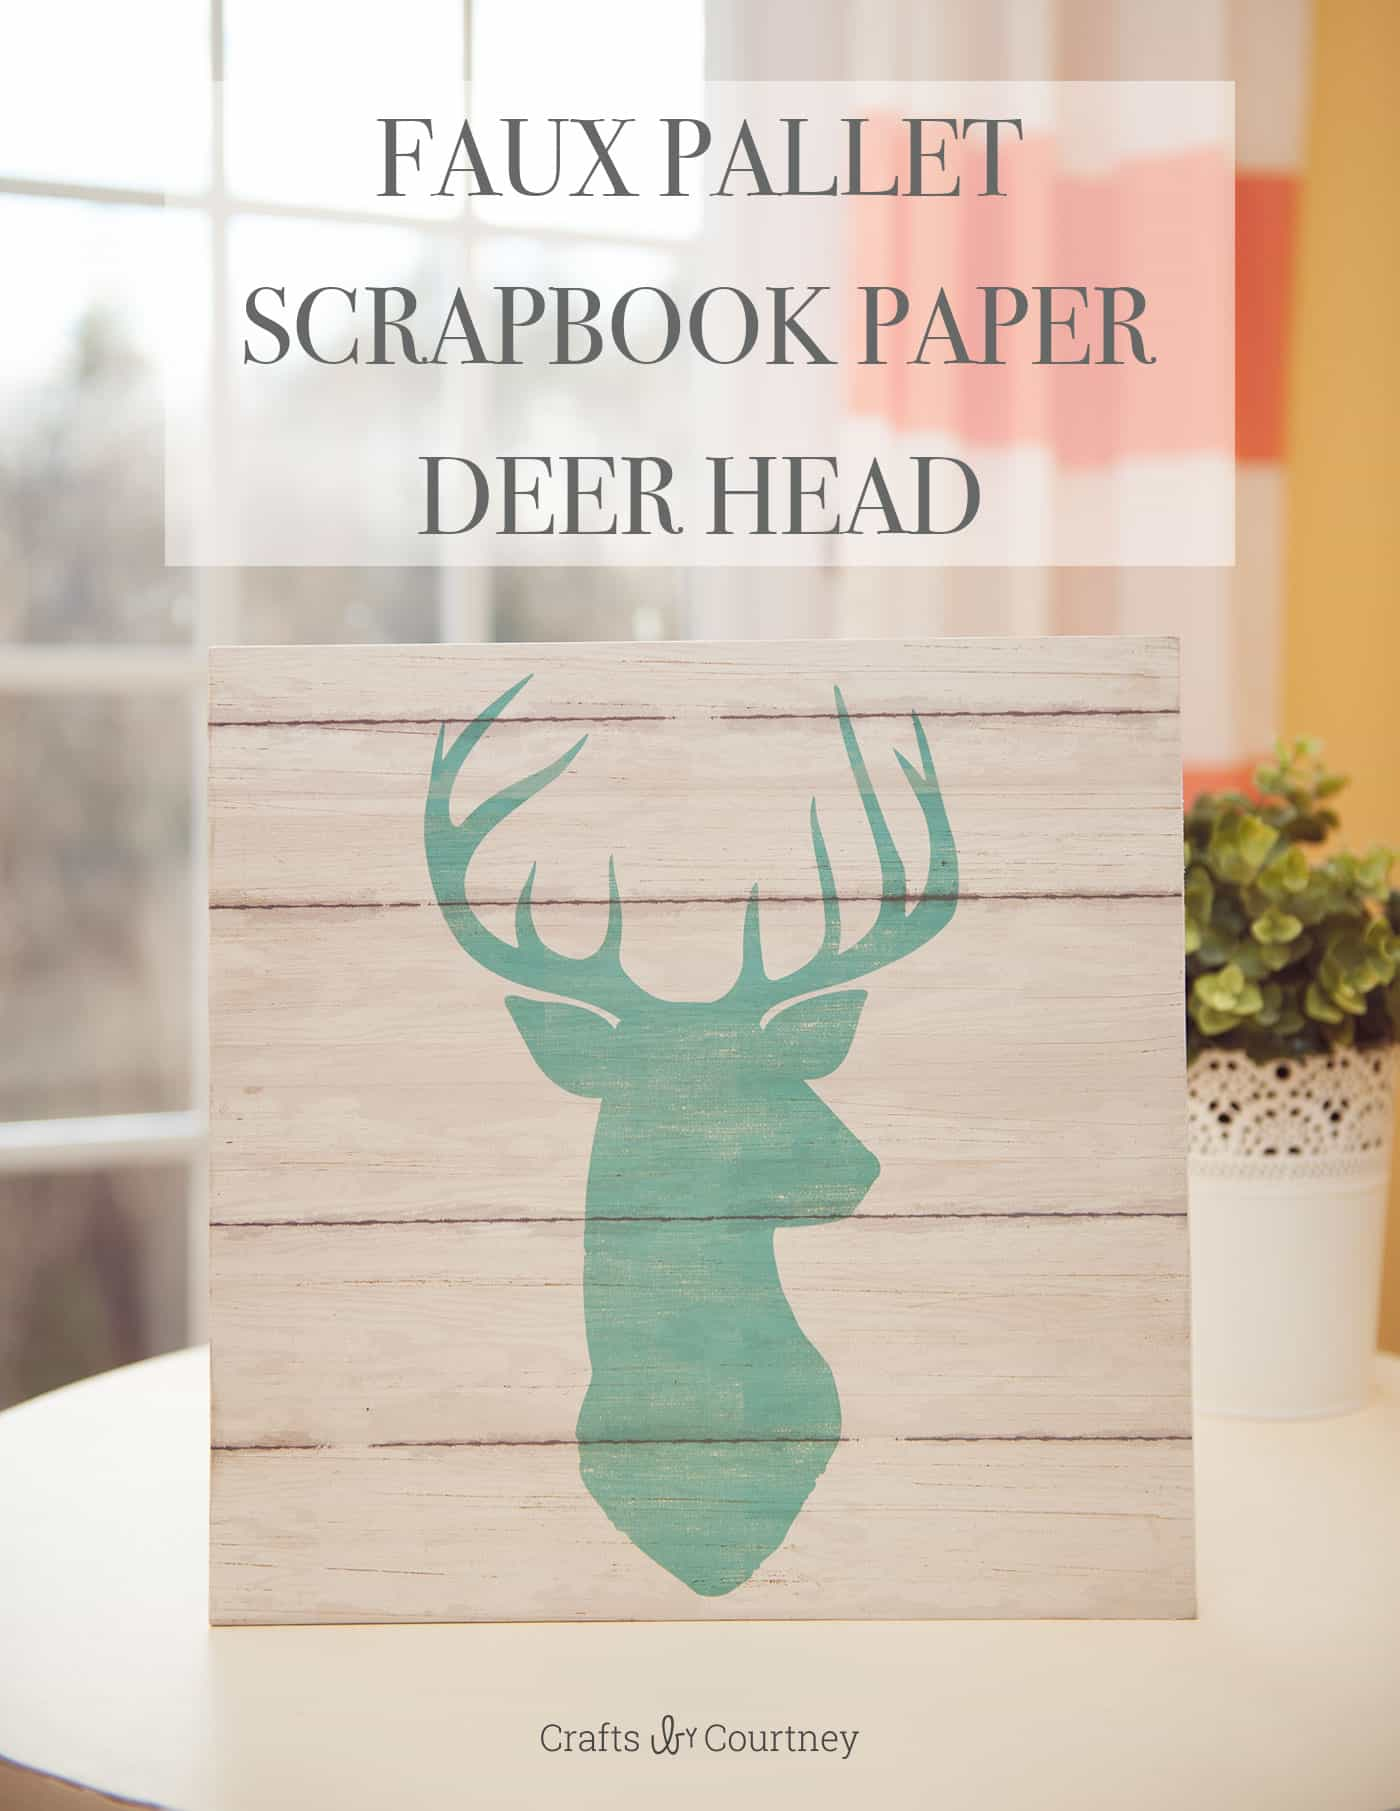 Diy Wall Decor Using Scrapbook Paper : Easy diy wall art with scrapbook paper mod podge rocks